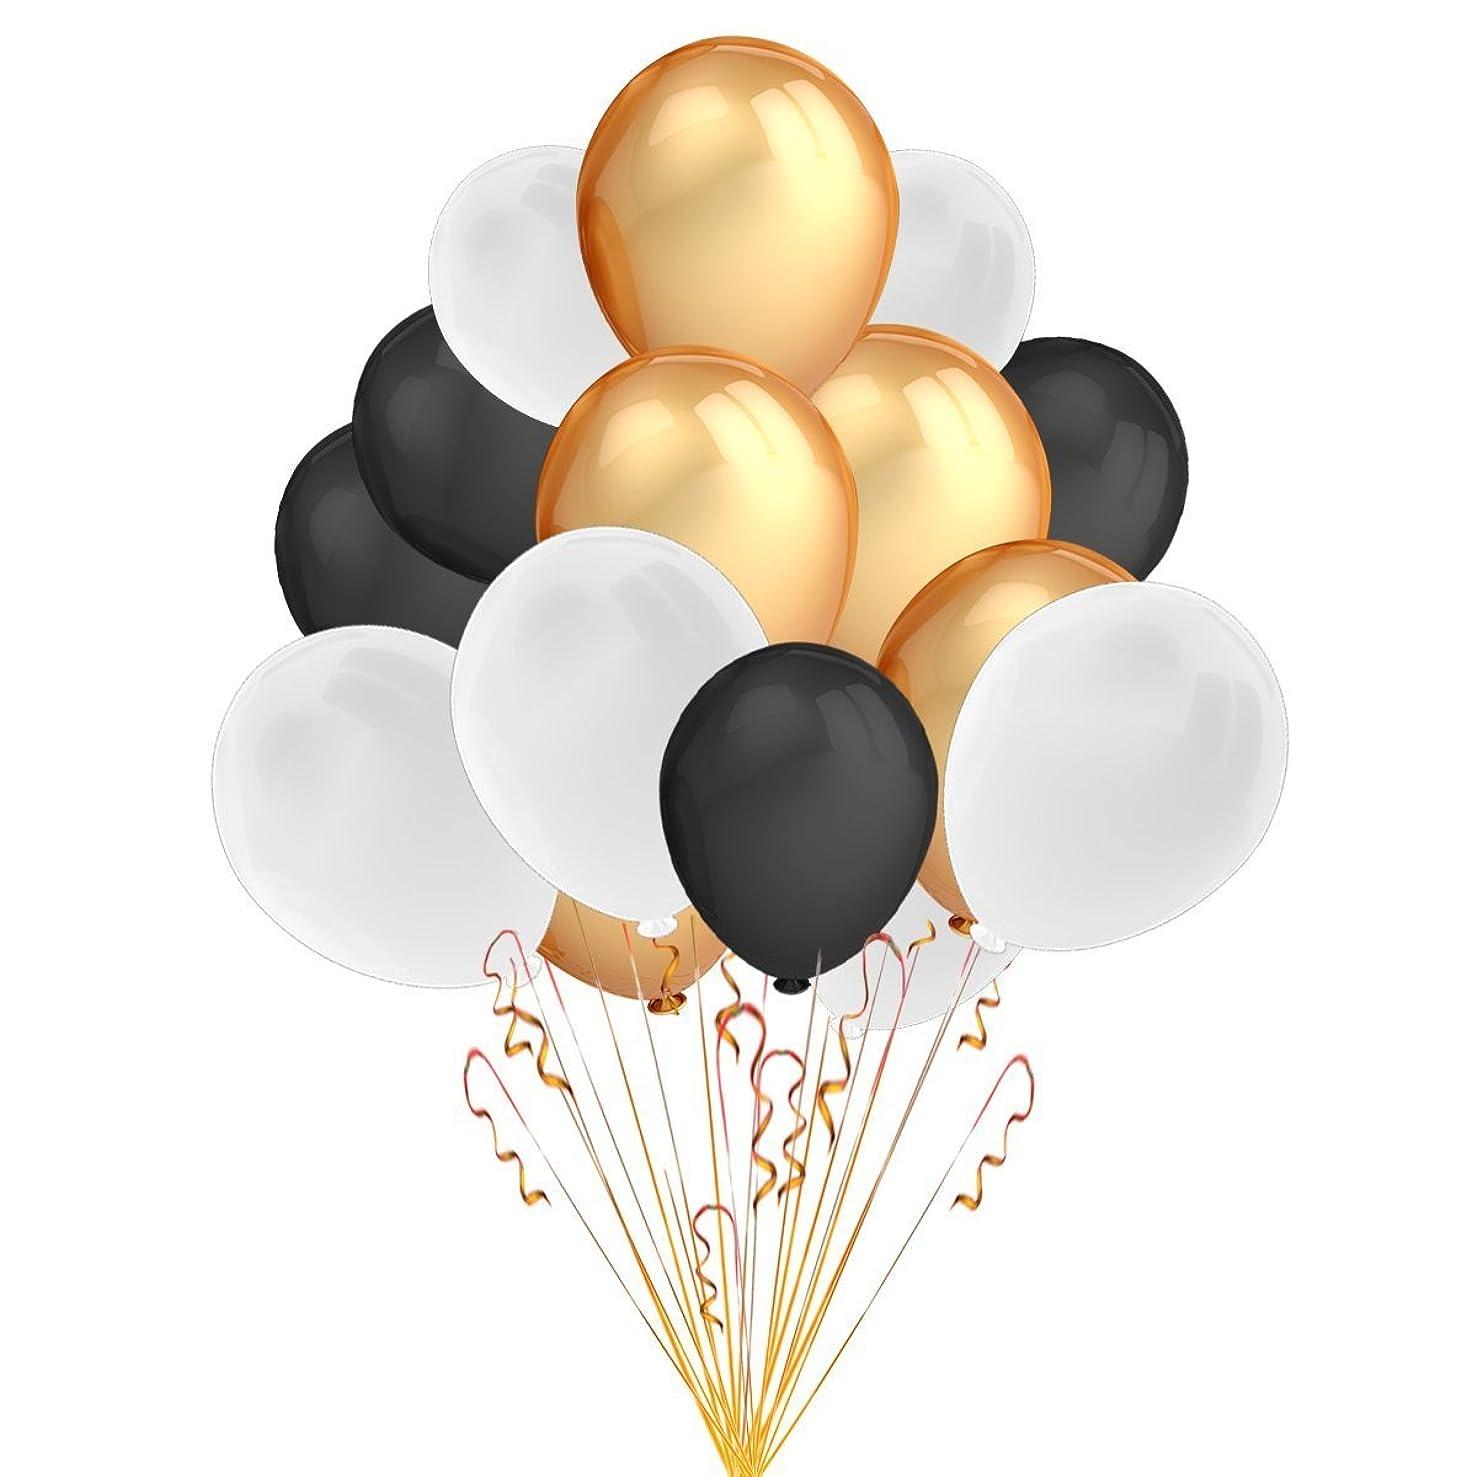 Aquila 100 Gold Black & White Pearl Balloons - 12